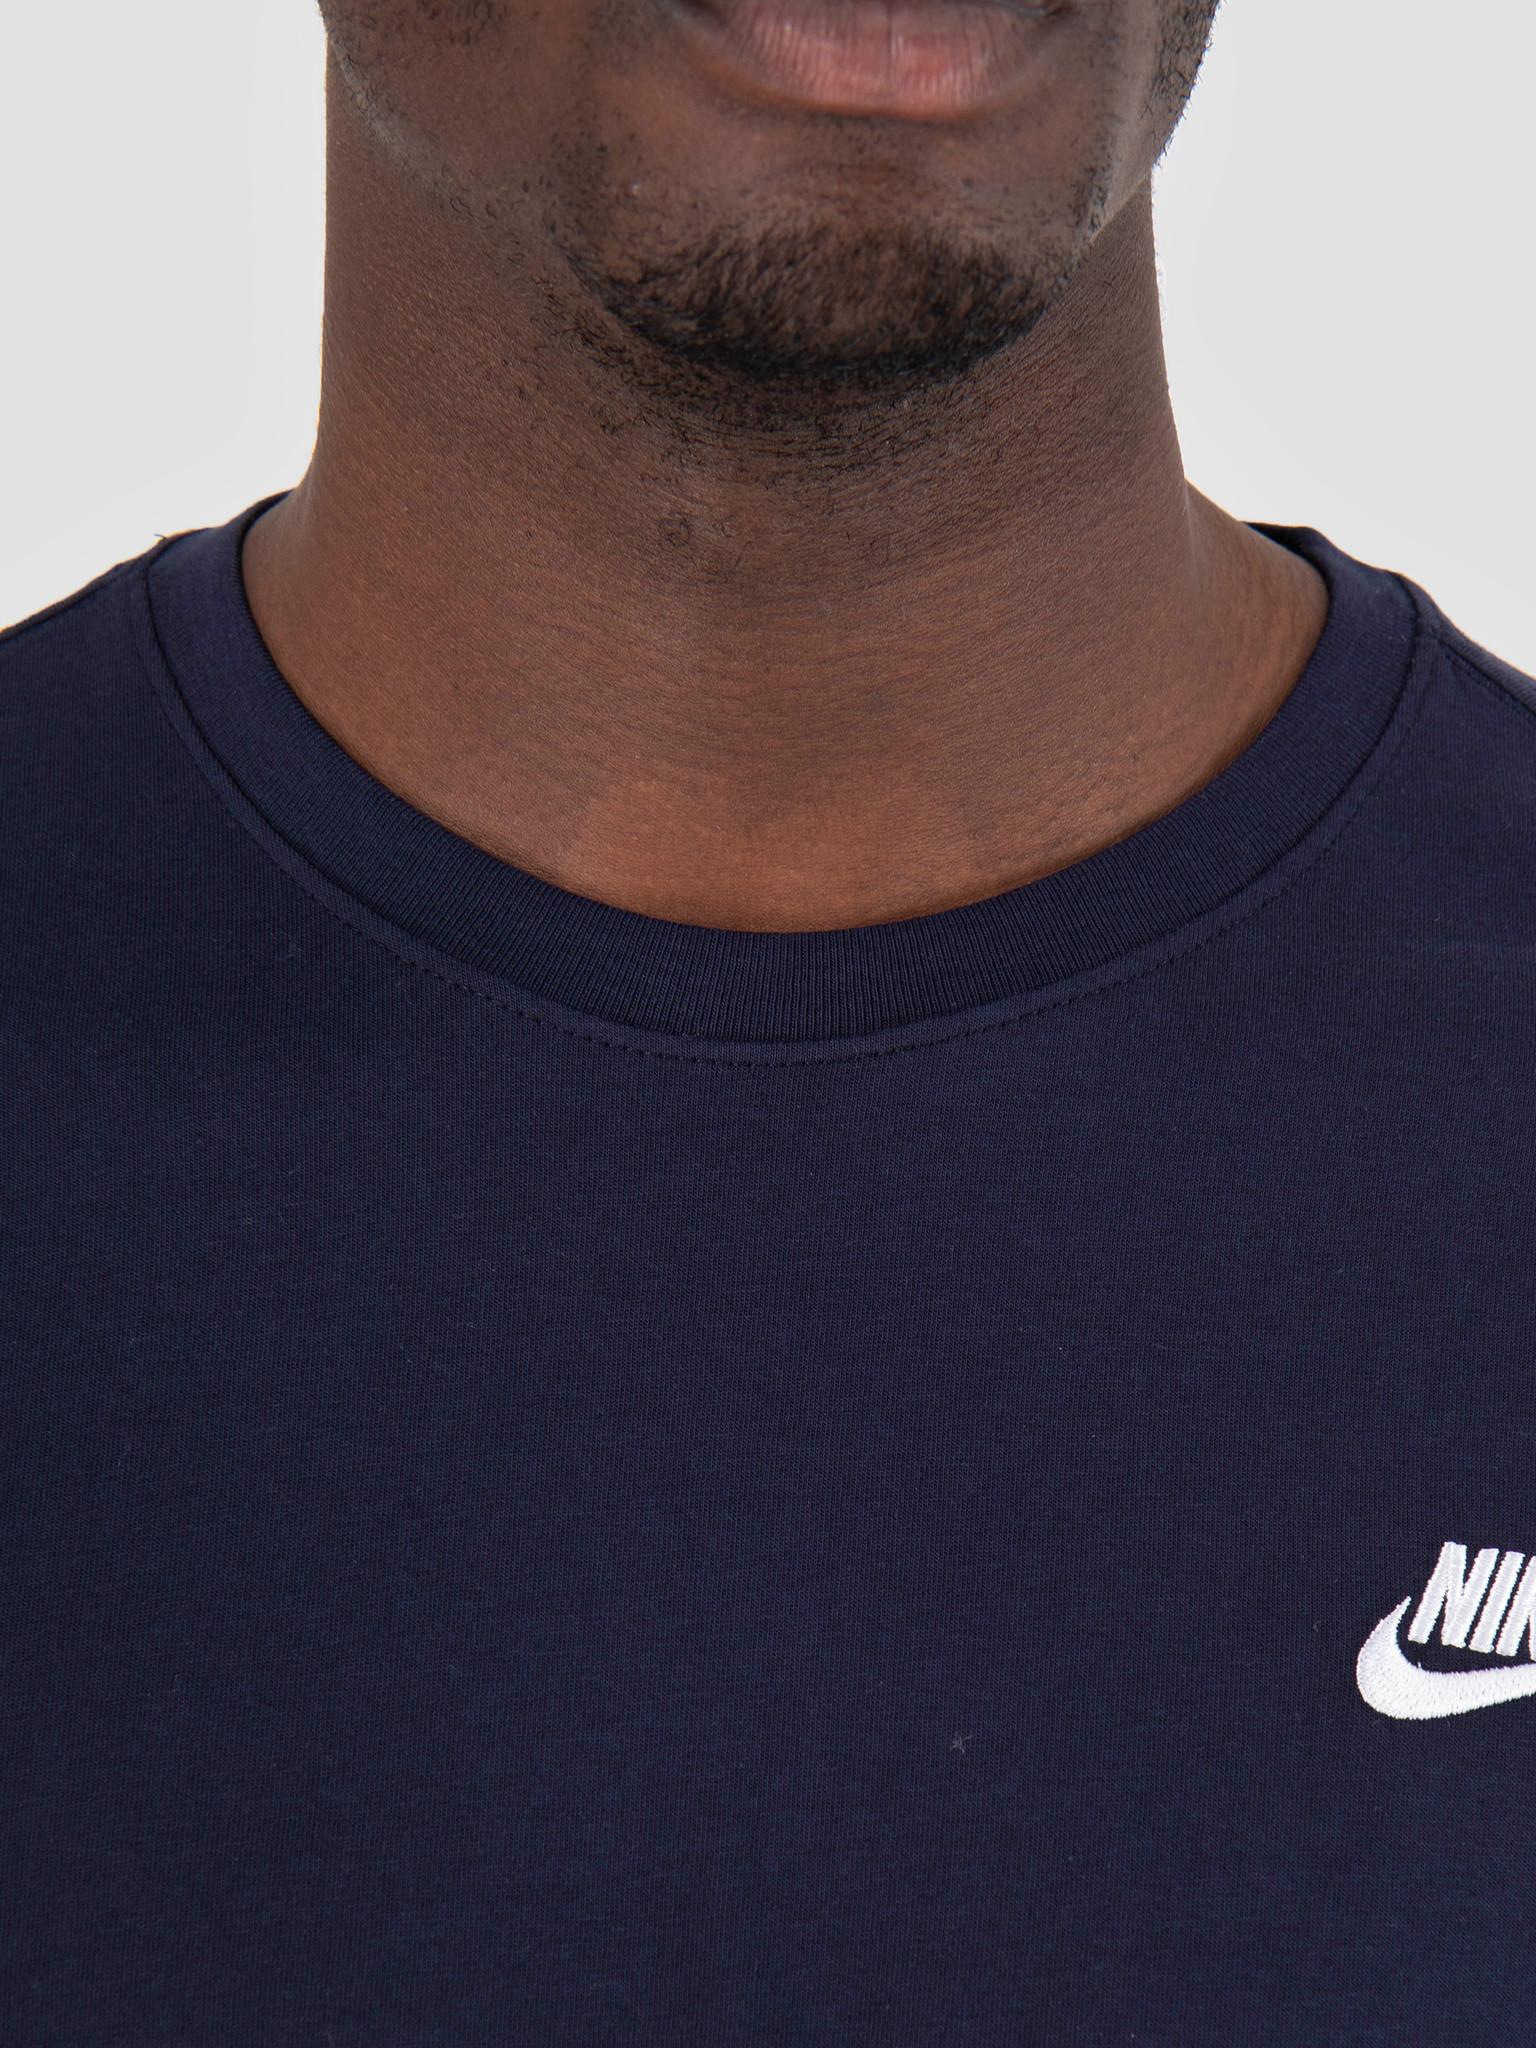 Nike Nike NSW Obsidian White Aq7141-451